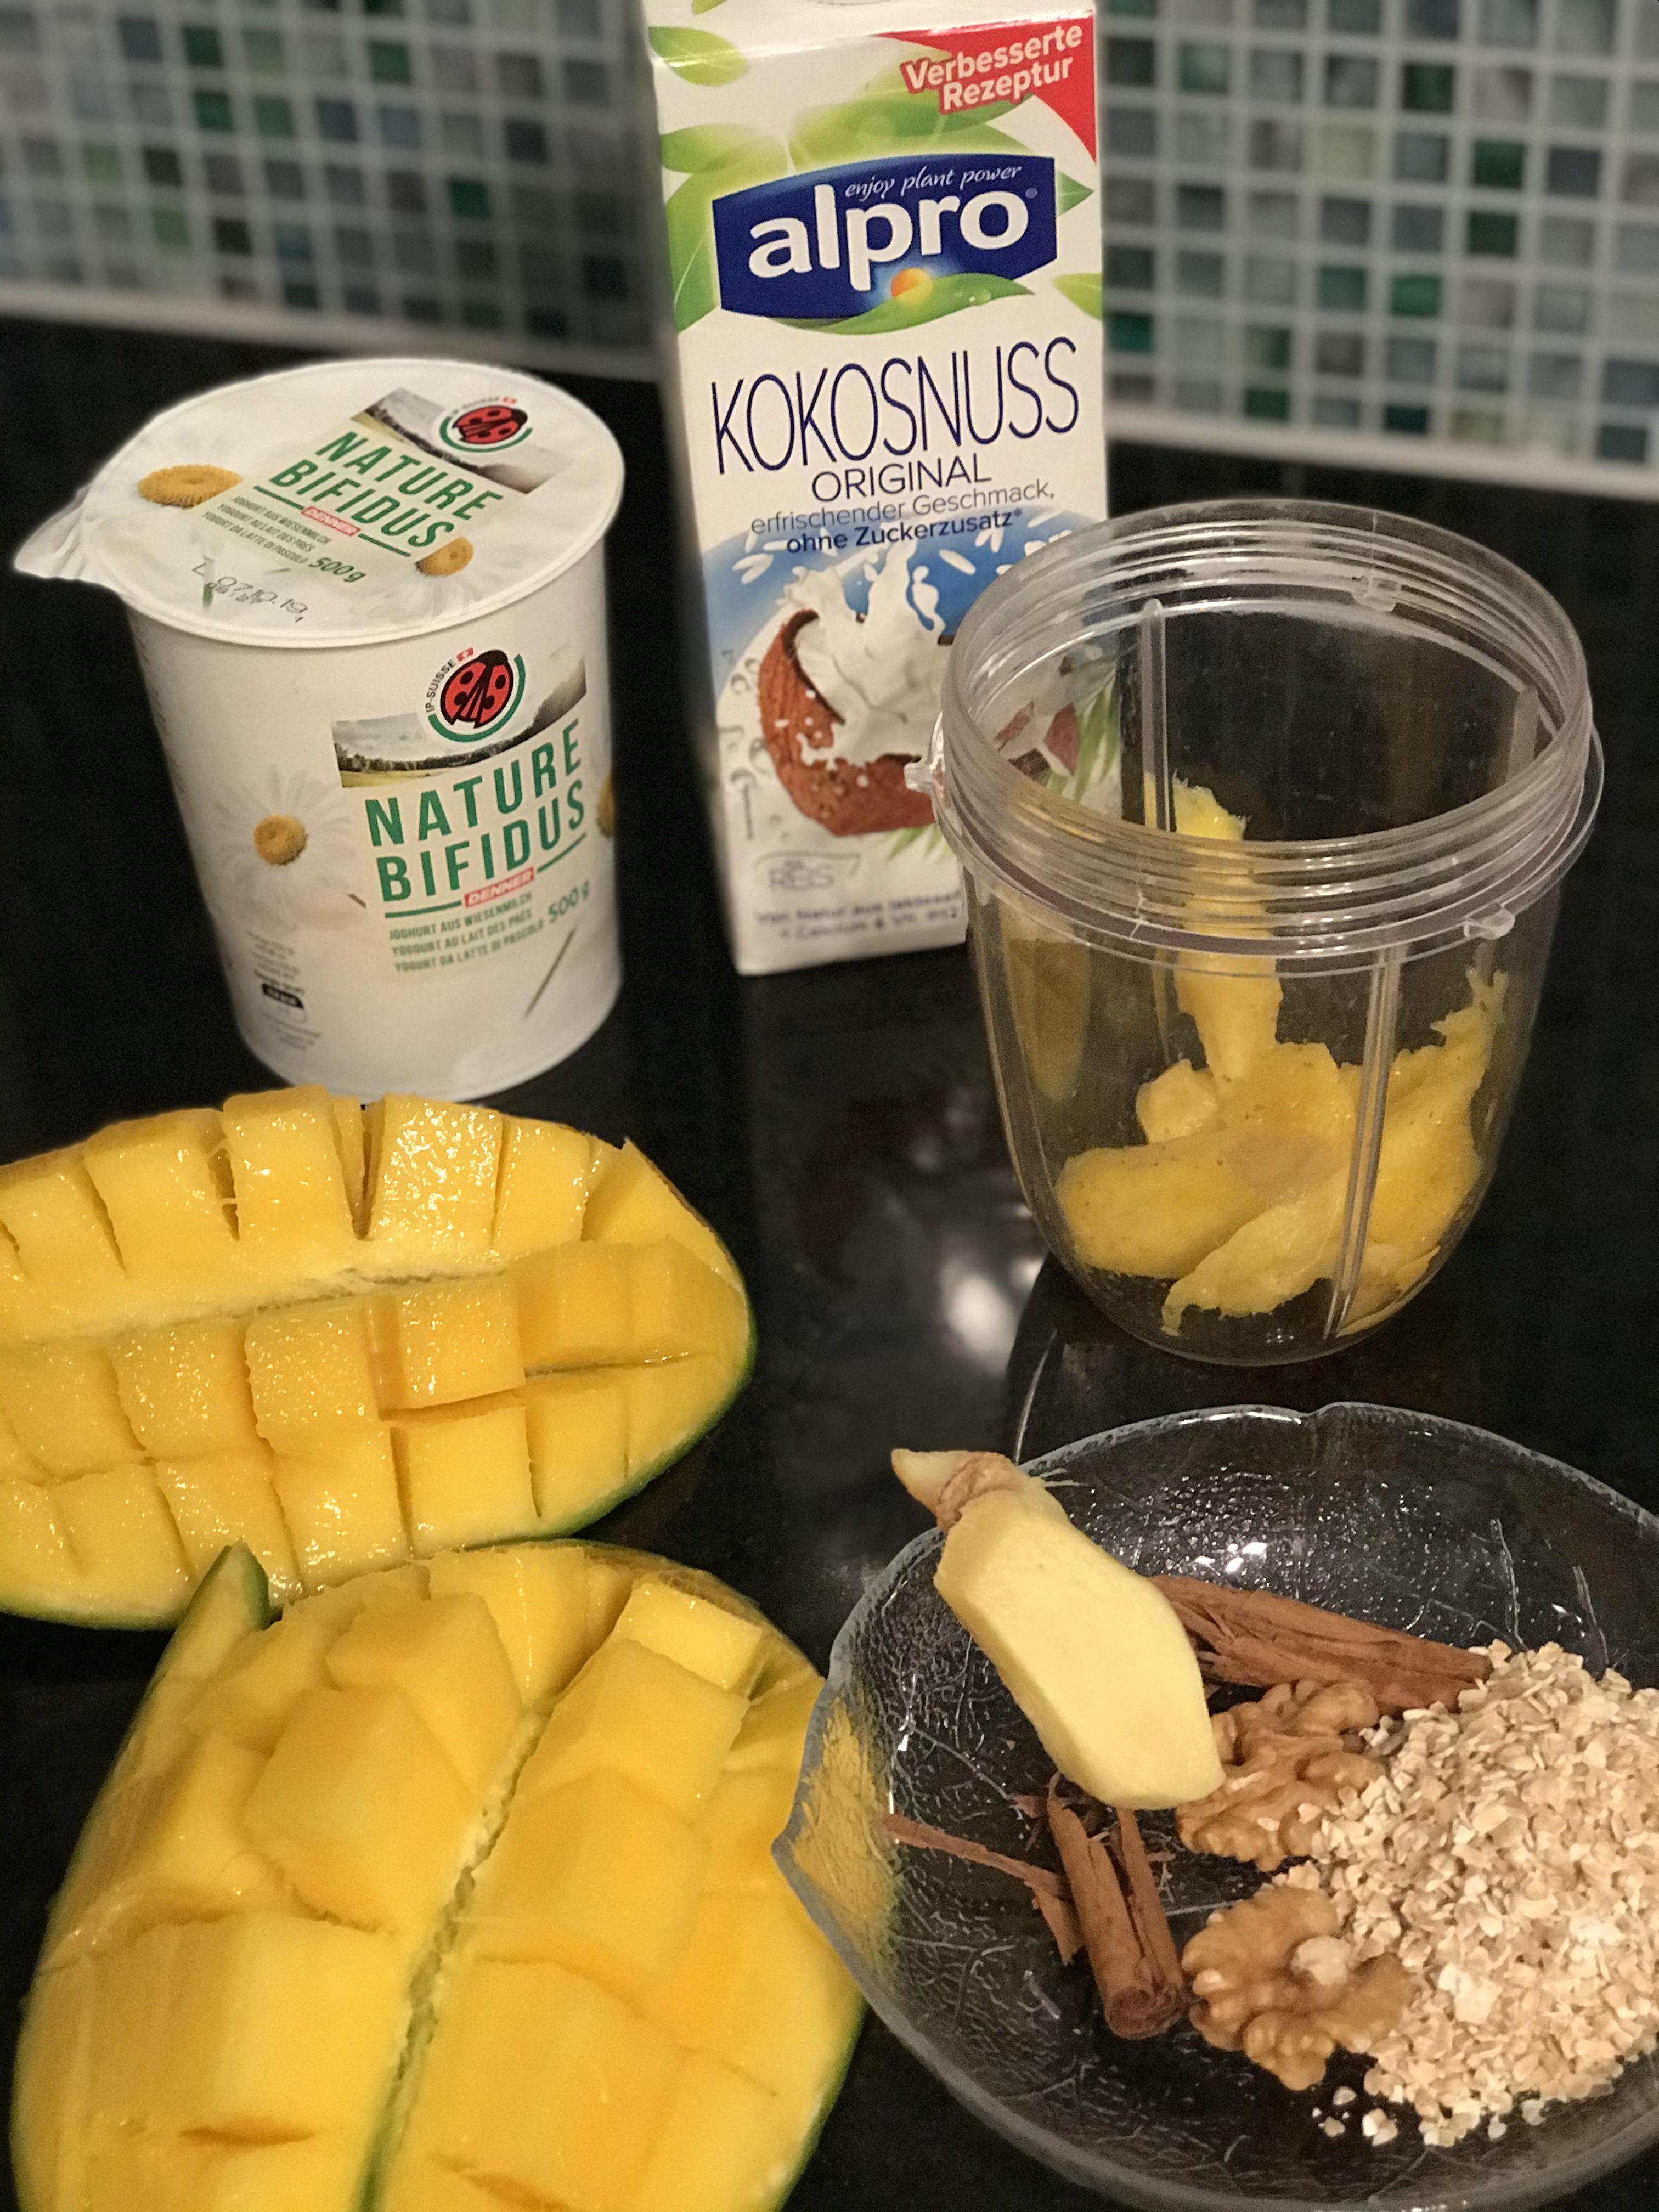 Mango Ingwer Zimtstange Walnusse Vollkorn Haferflocken Joghurt Kokosmilch Rezepte Kokos Kokosnuss